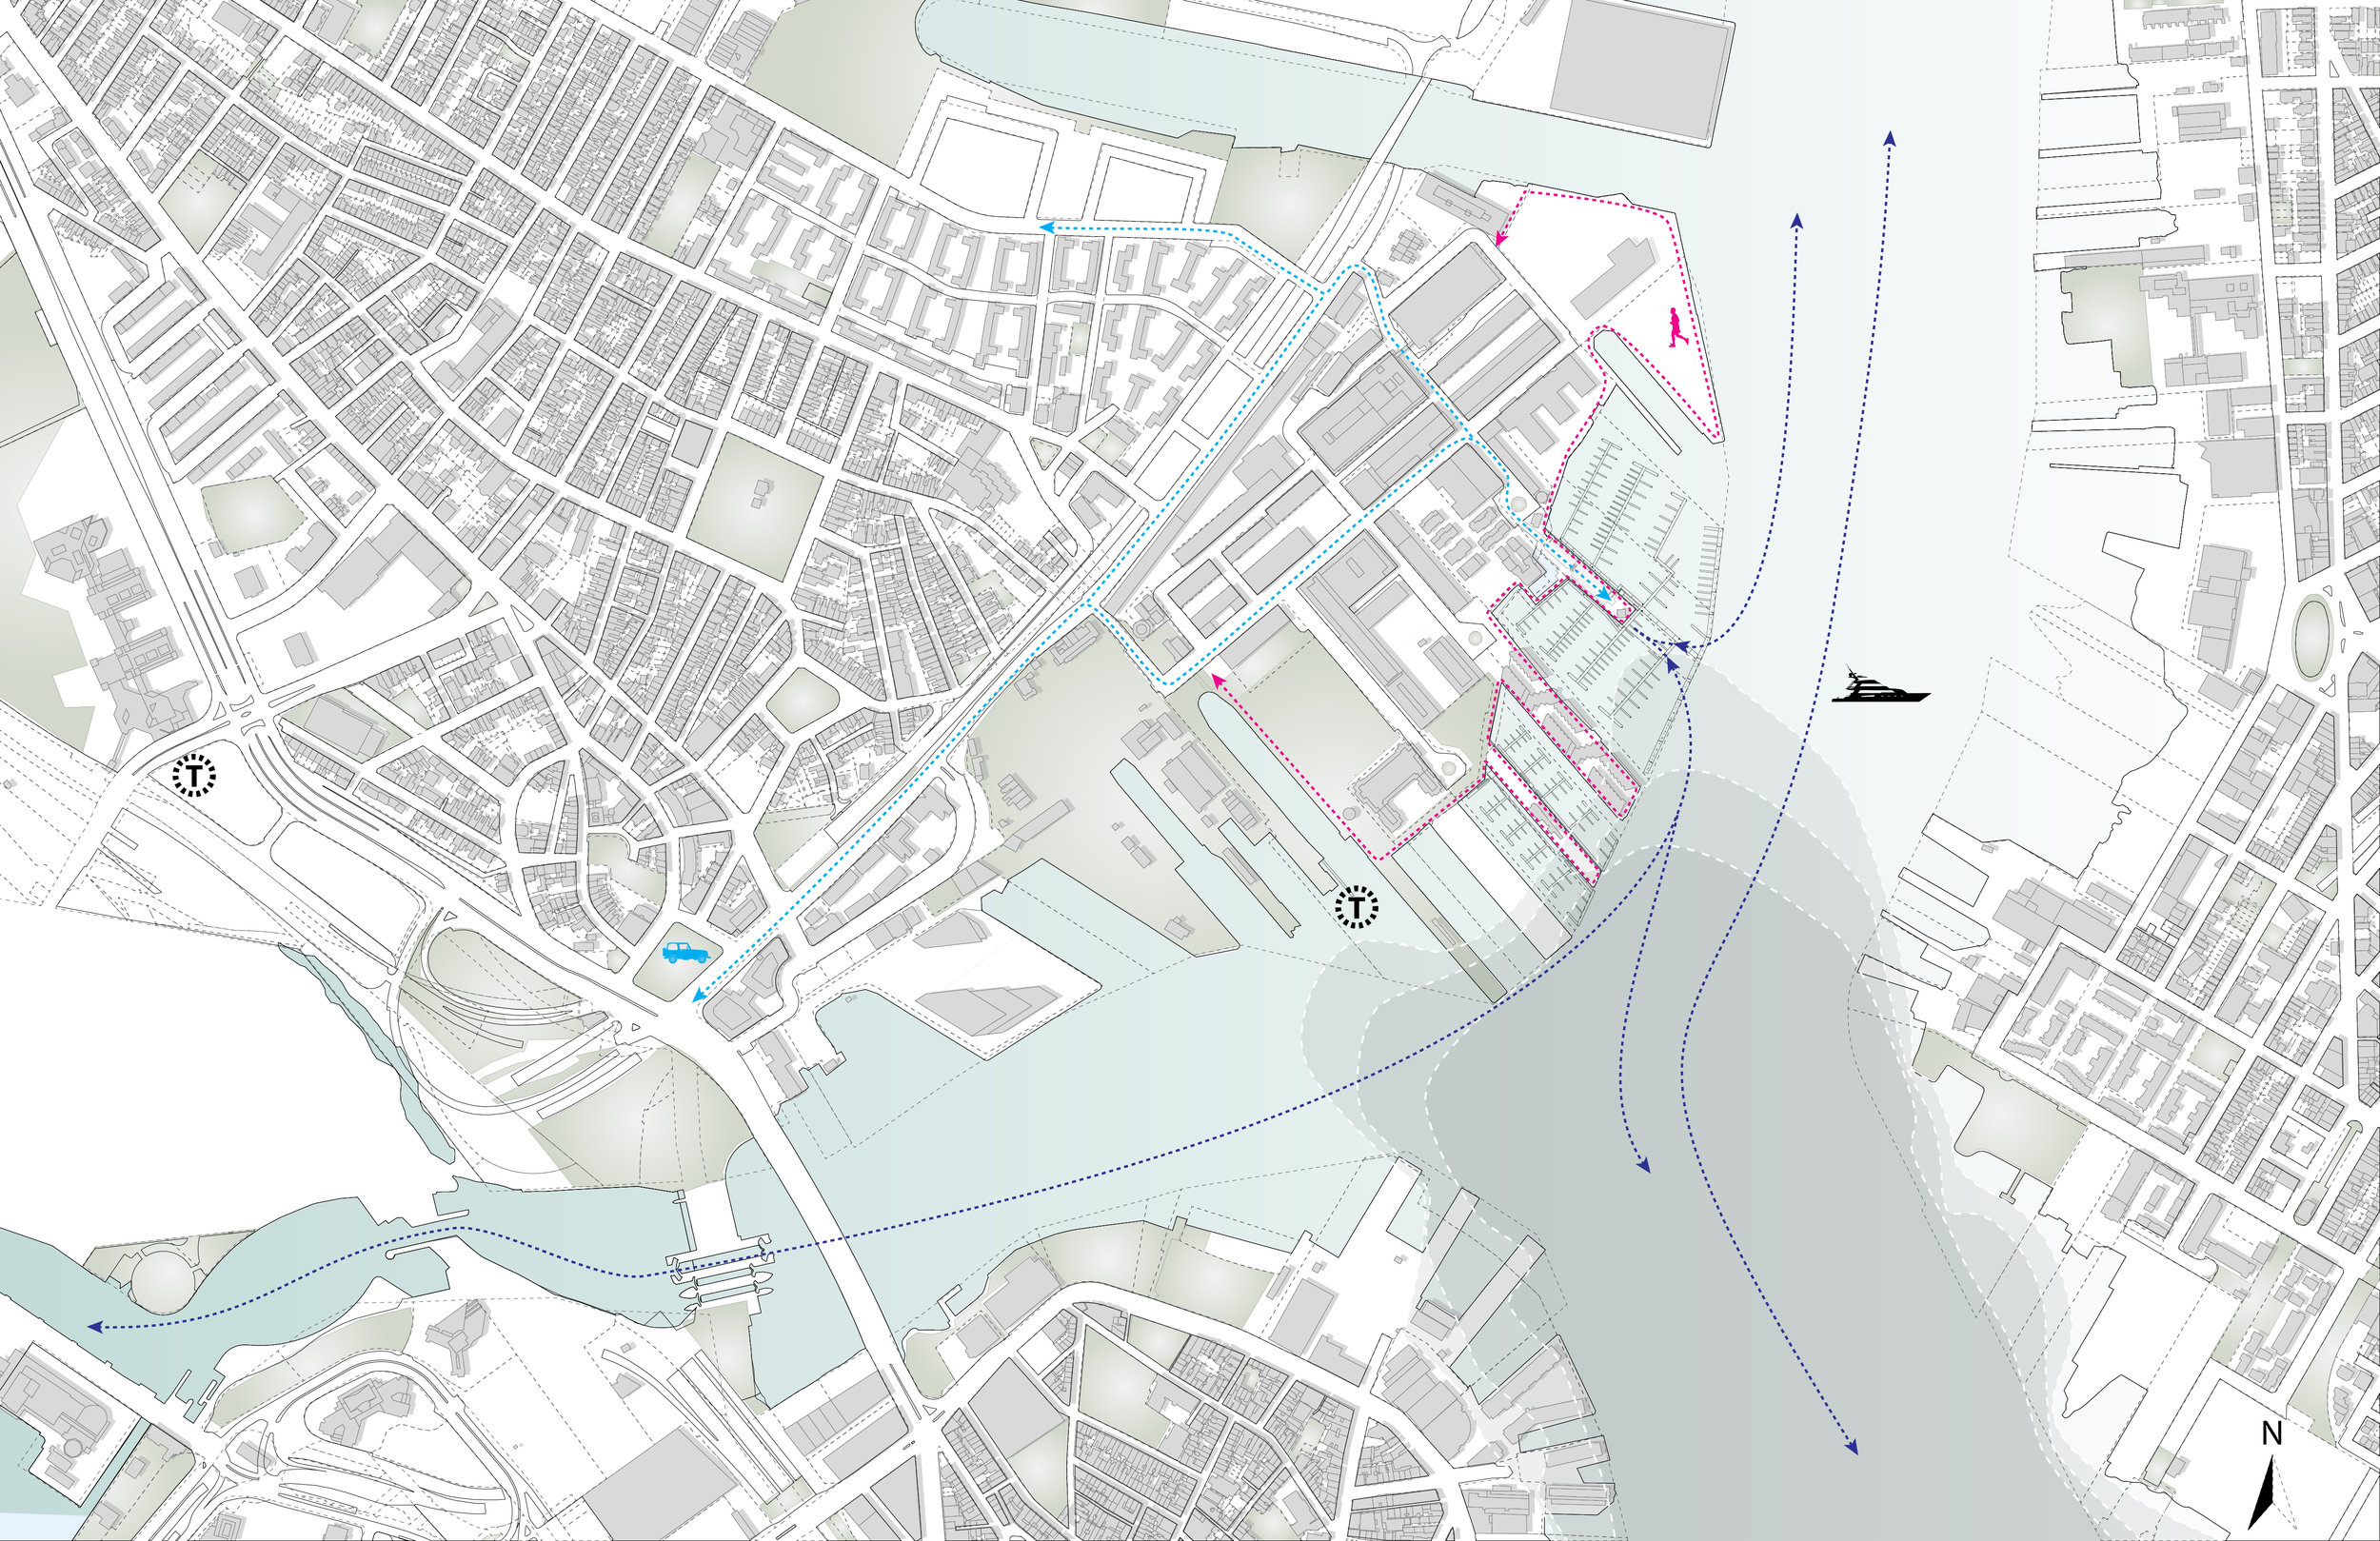 17-0331_site_map.jpg